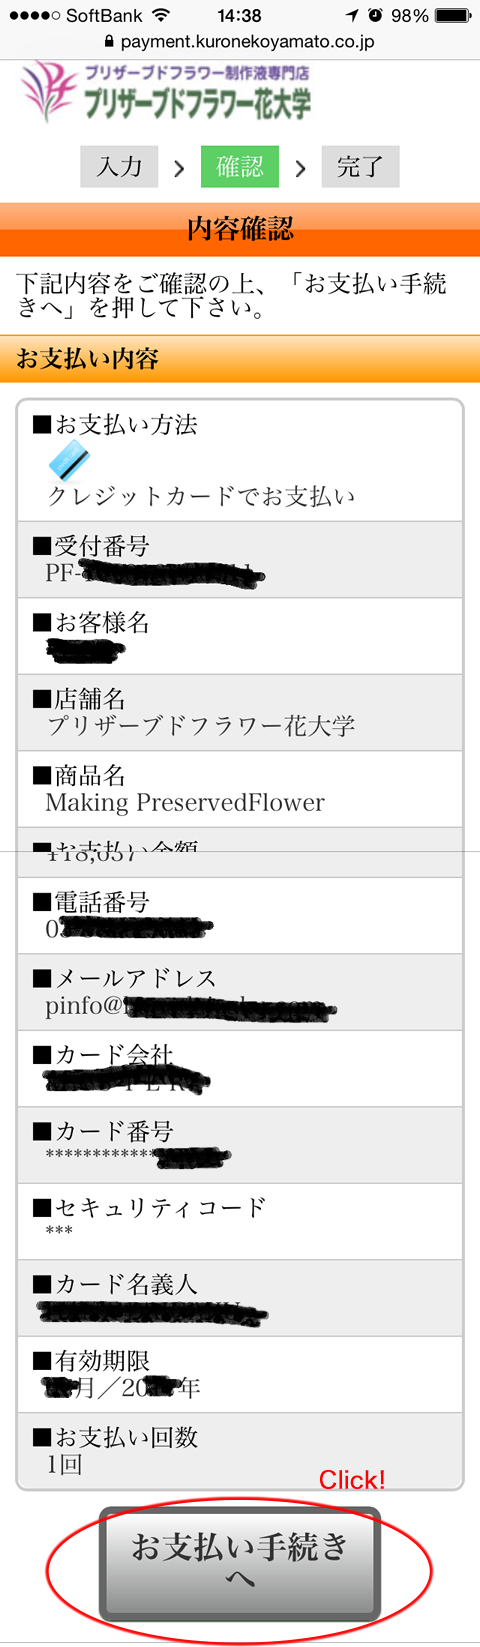 yamato-m04.jpg